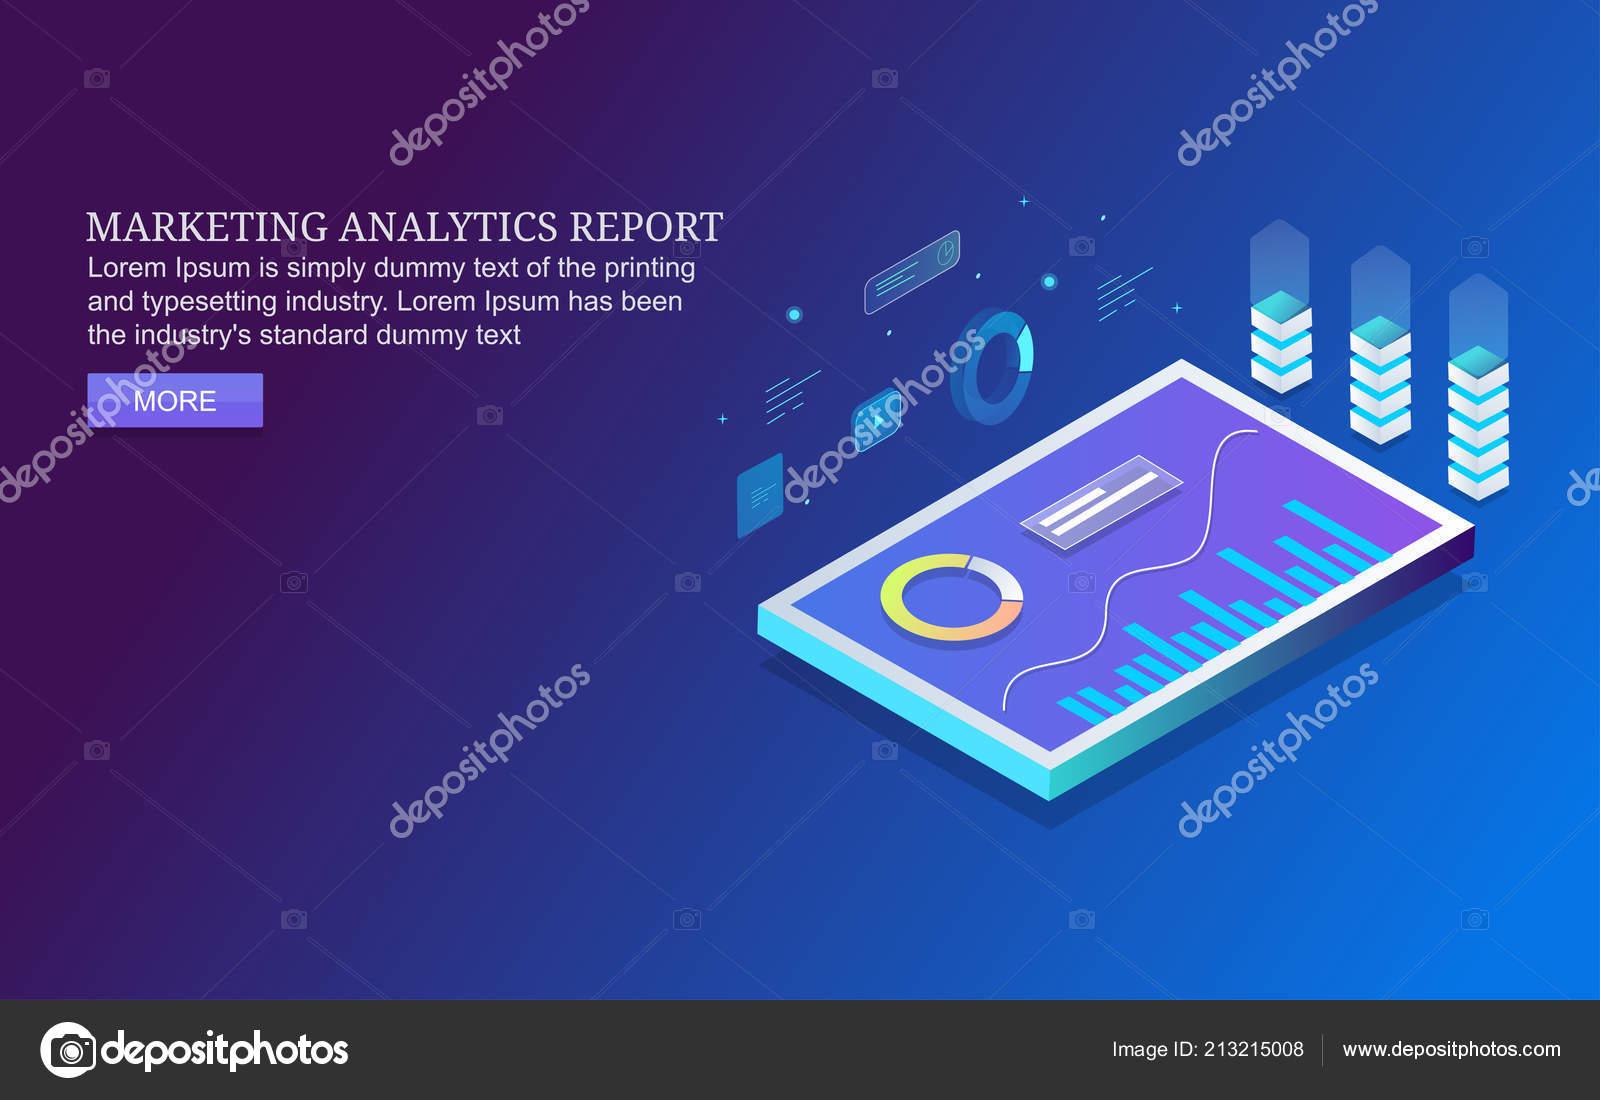 Marketing Analytics Report Mobile Analytics App Mobile